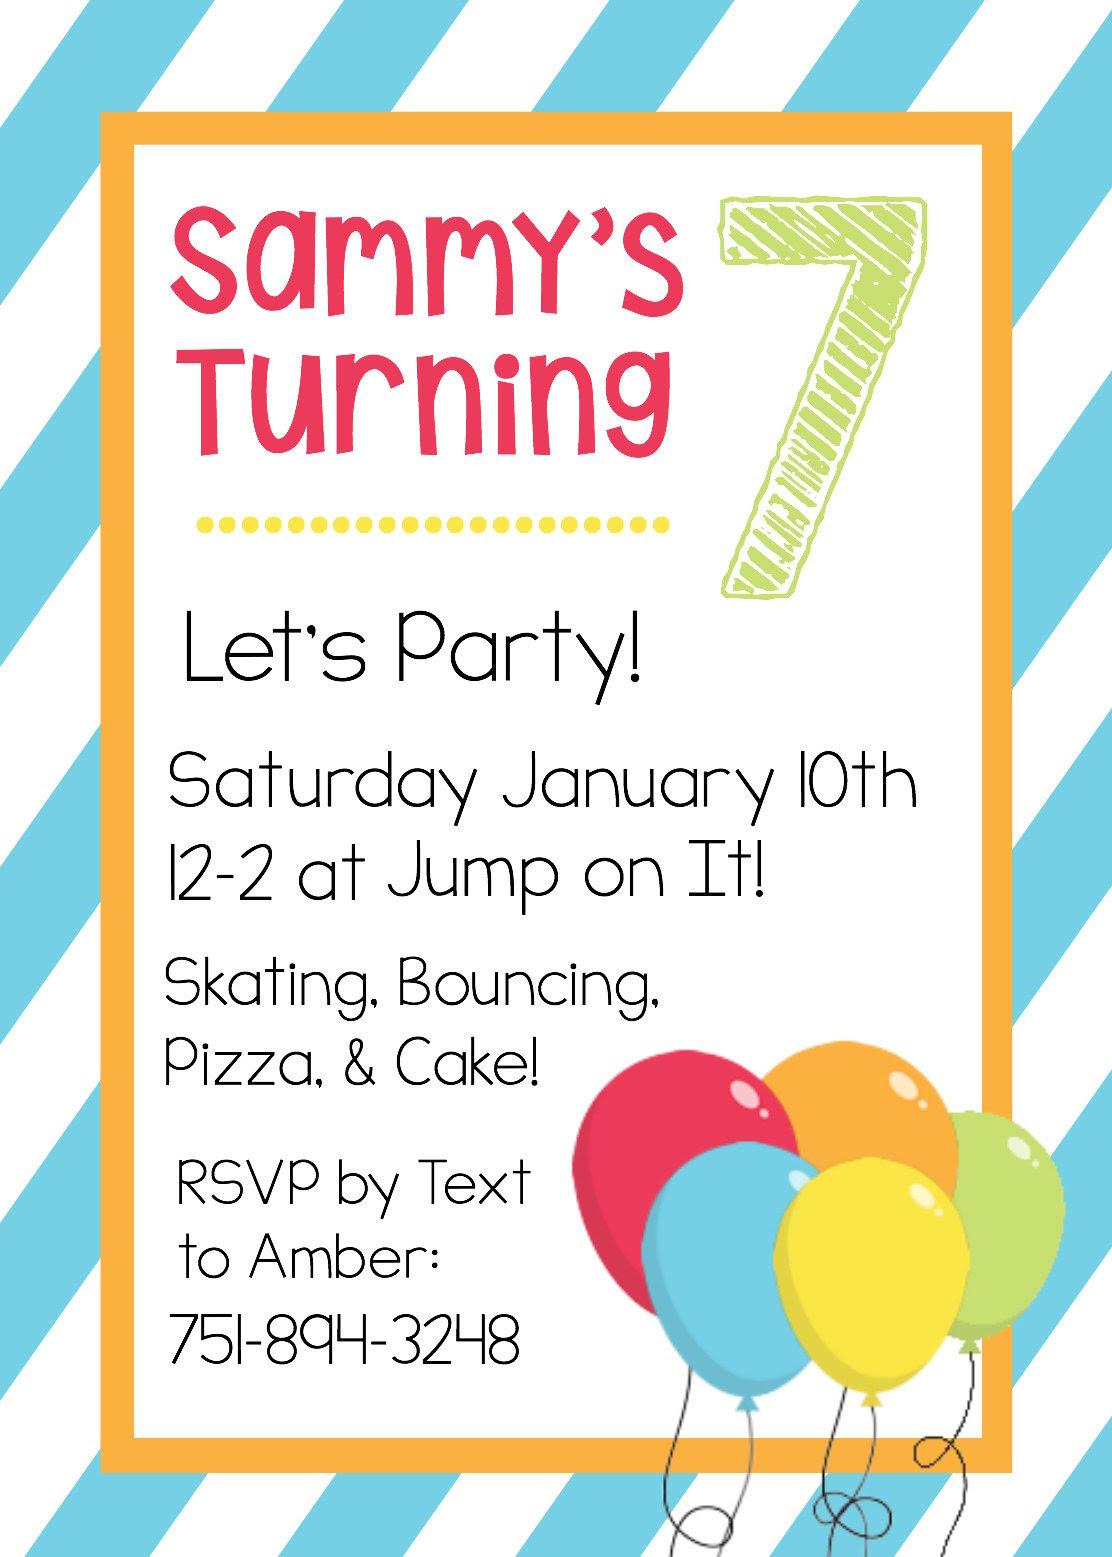 17+ Kids Party Invitation Designs & Templates - PSD